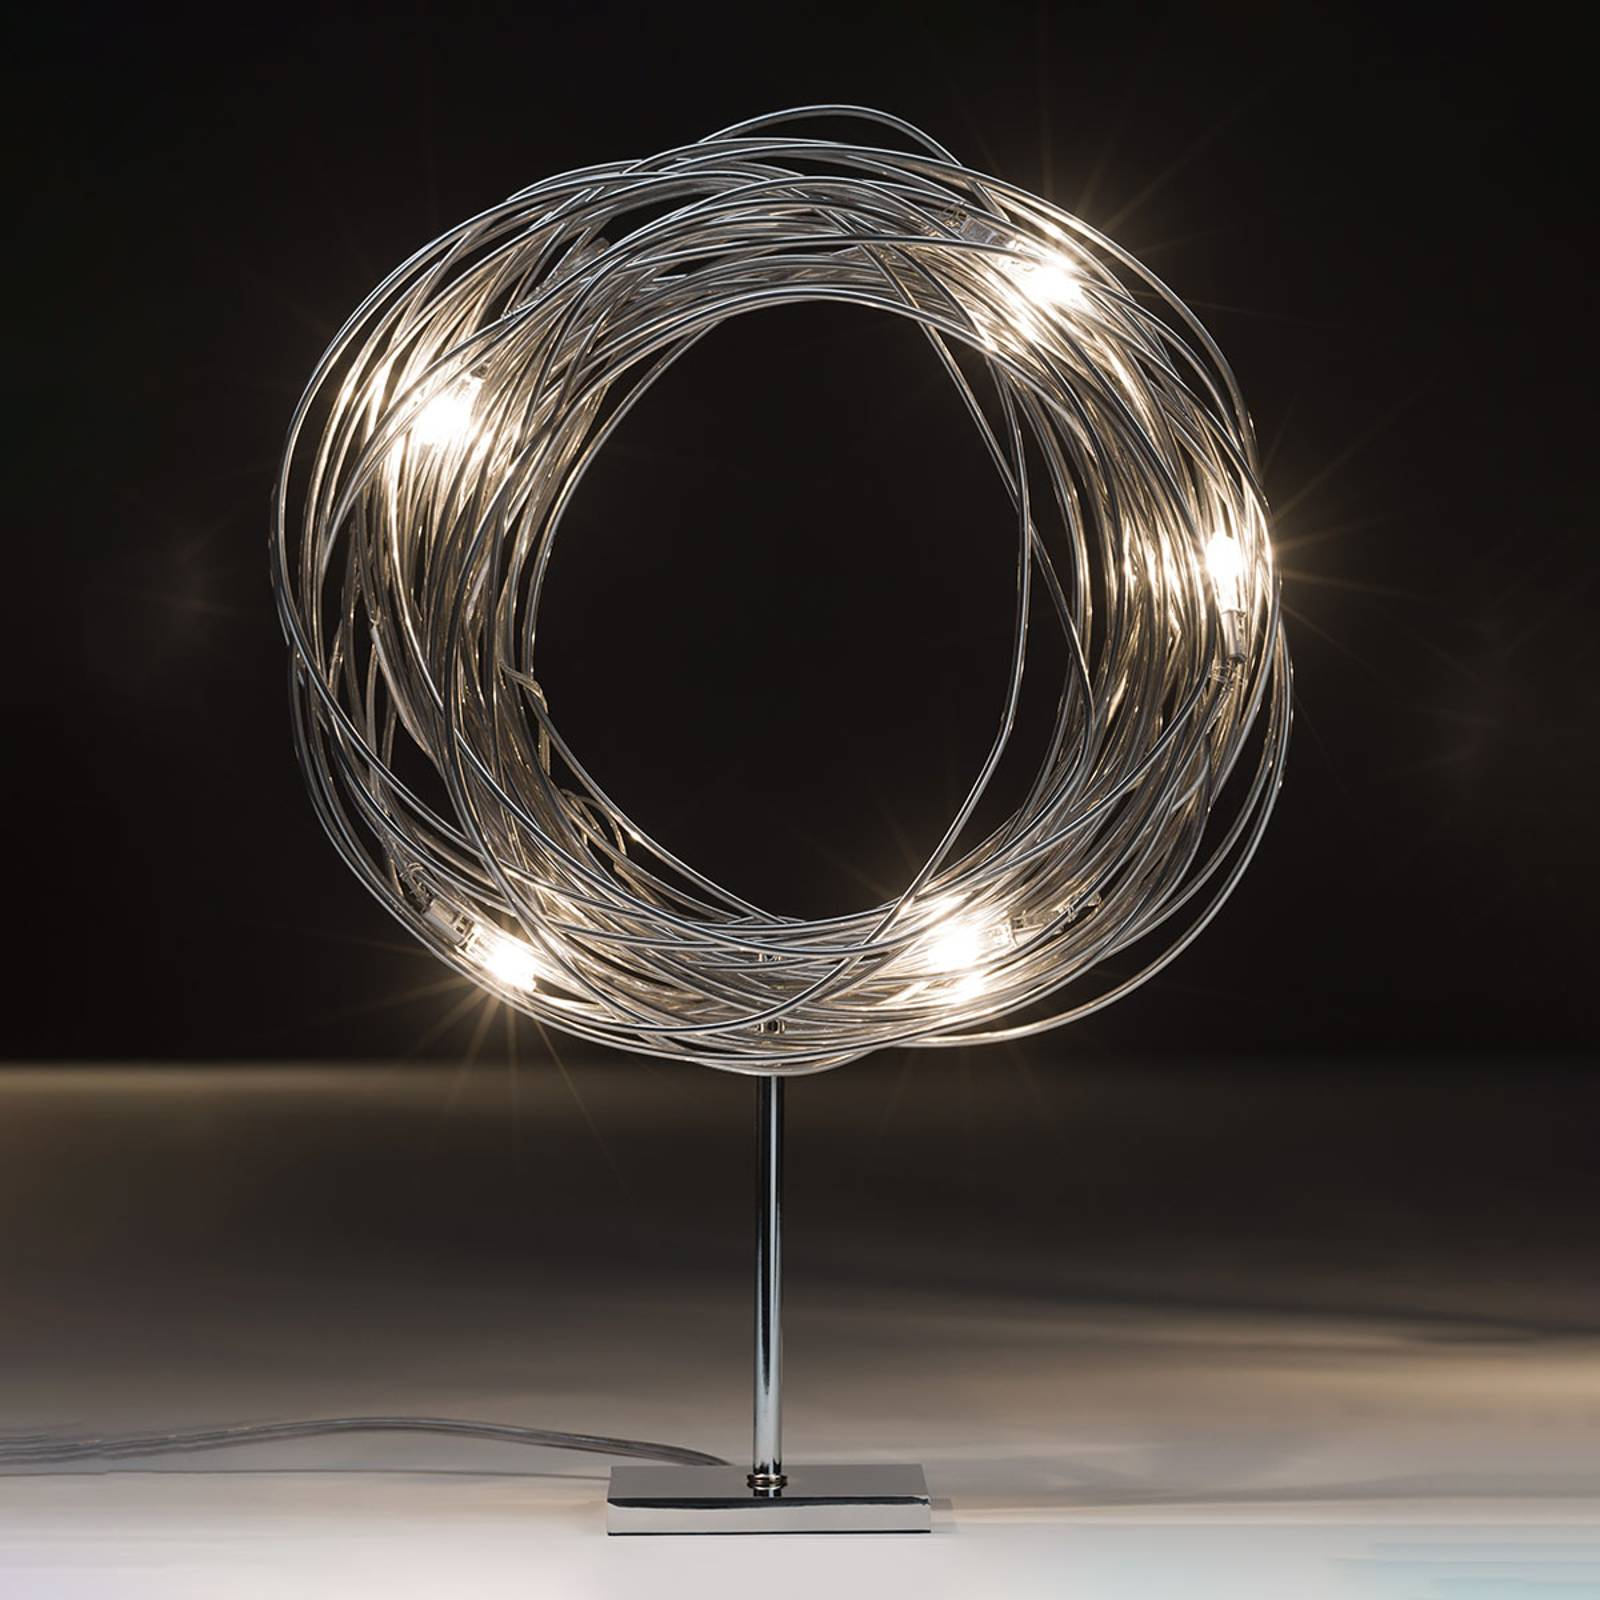 Knikerboker Confusione - moderne LED tafellamp